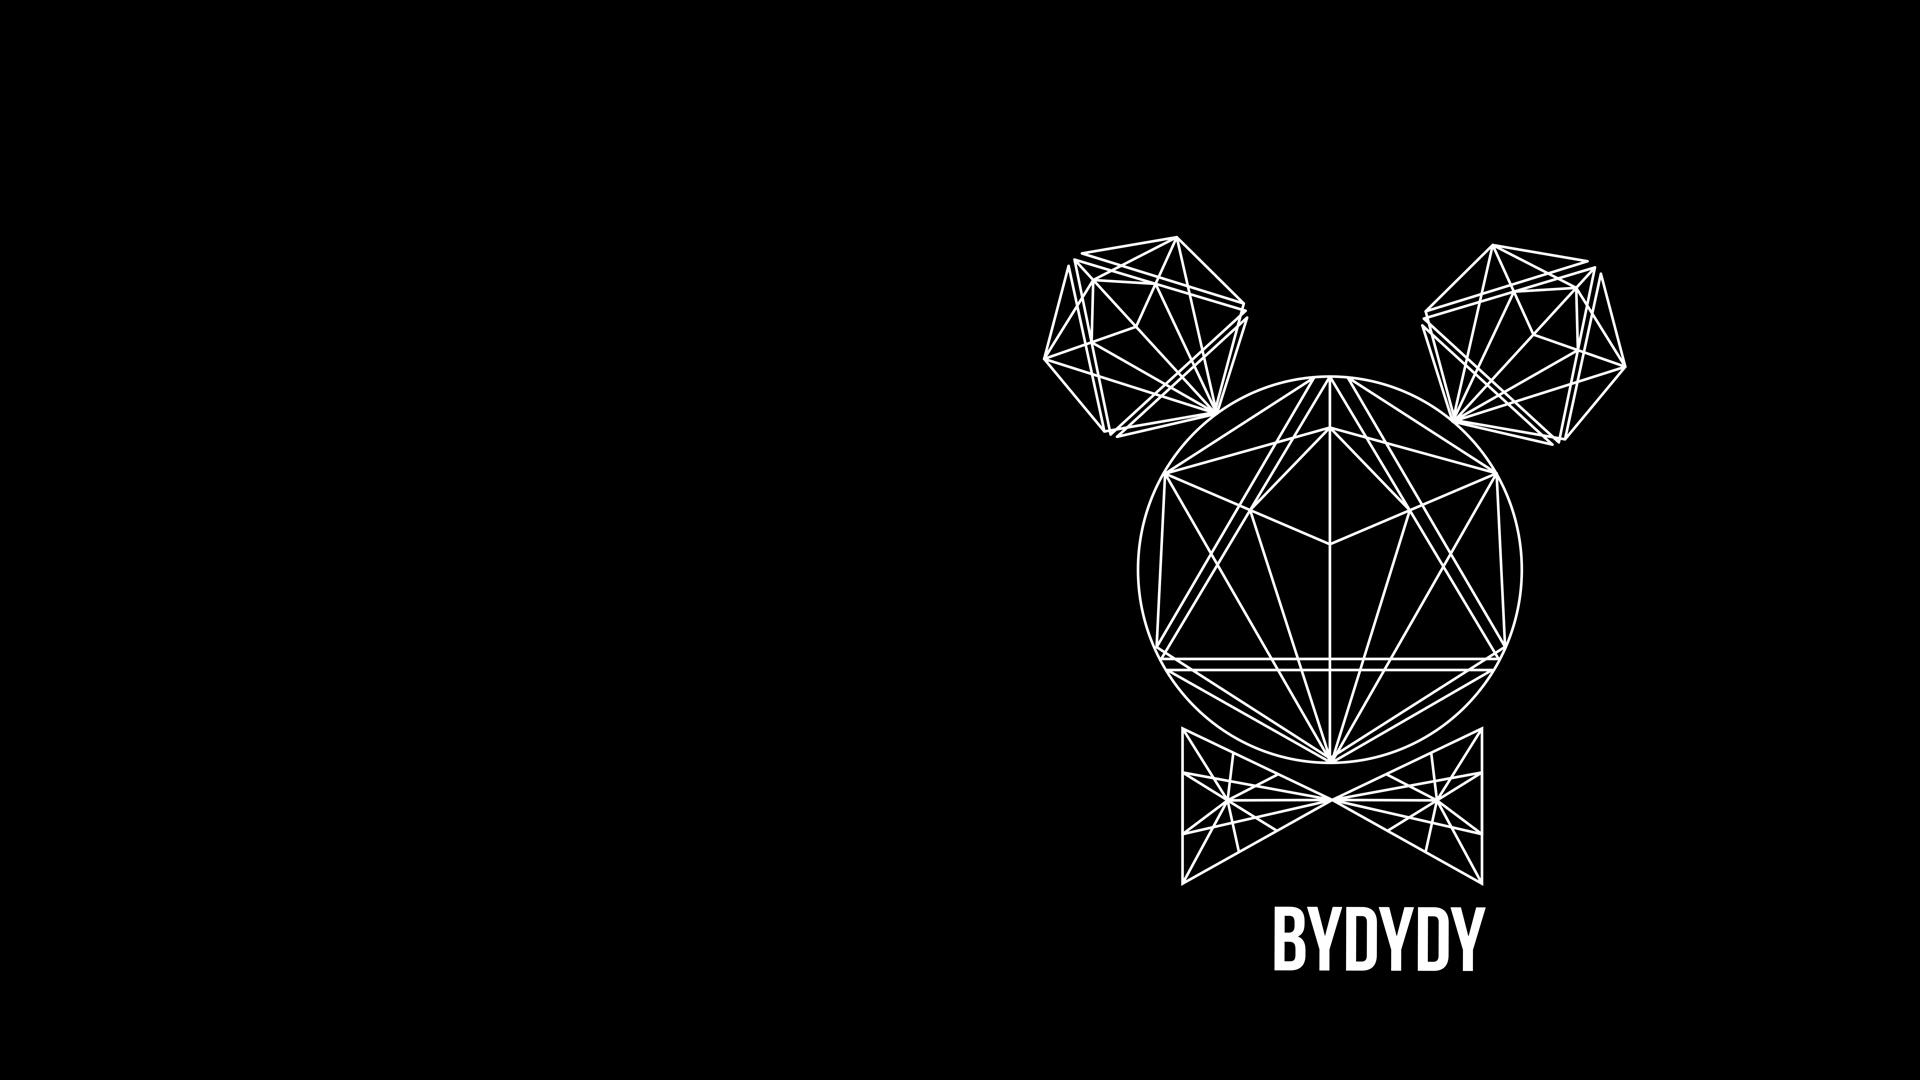 BYDYDY